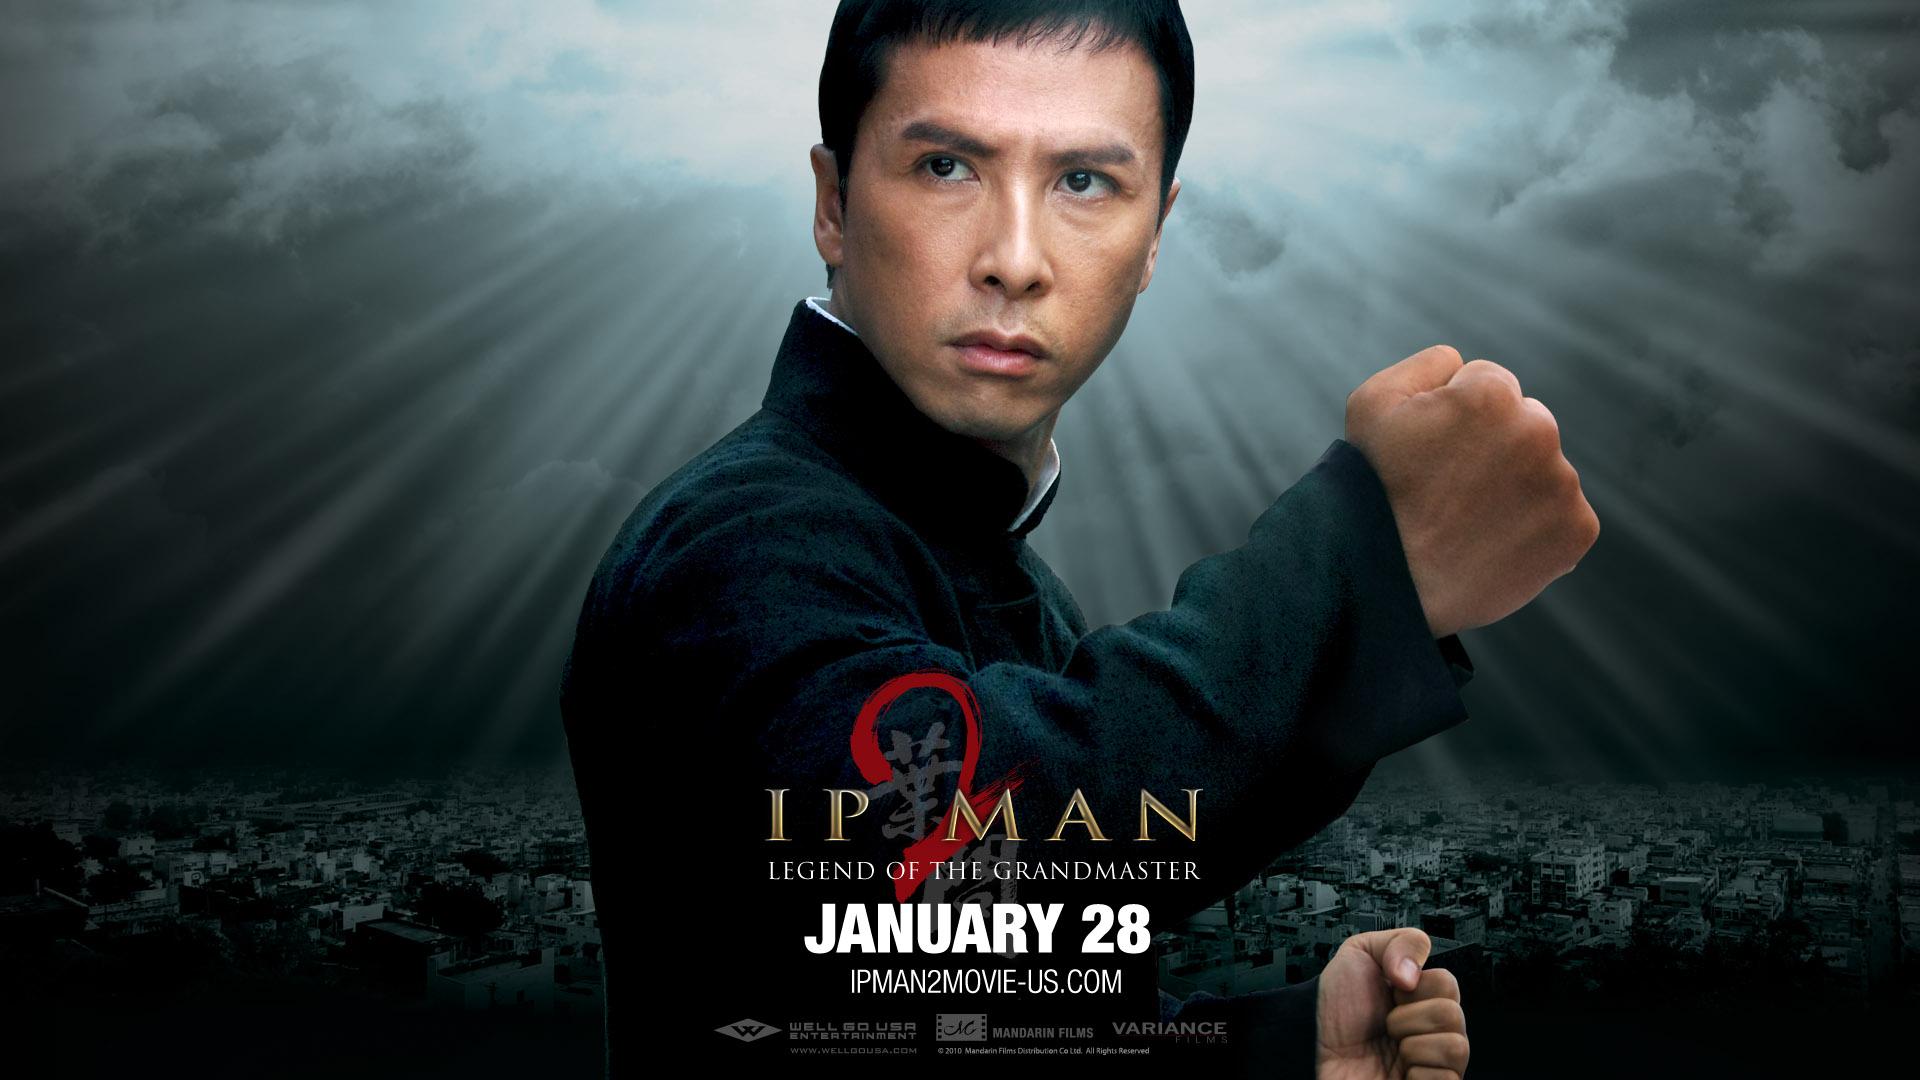 Ip Man 2 Legend of the Grandmaster ยิปมัน 2 เจ้ากังฟู สู้ยิปตา 2010